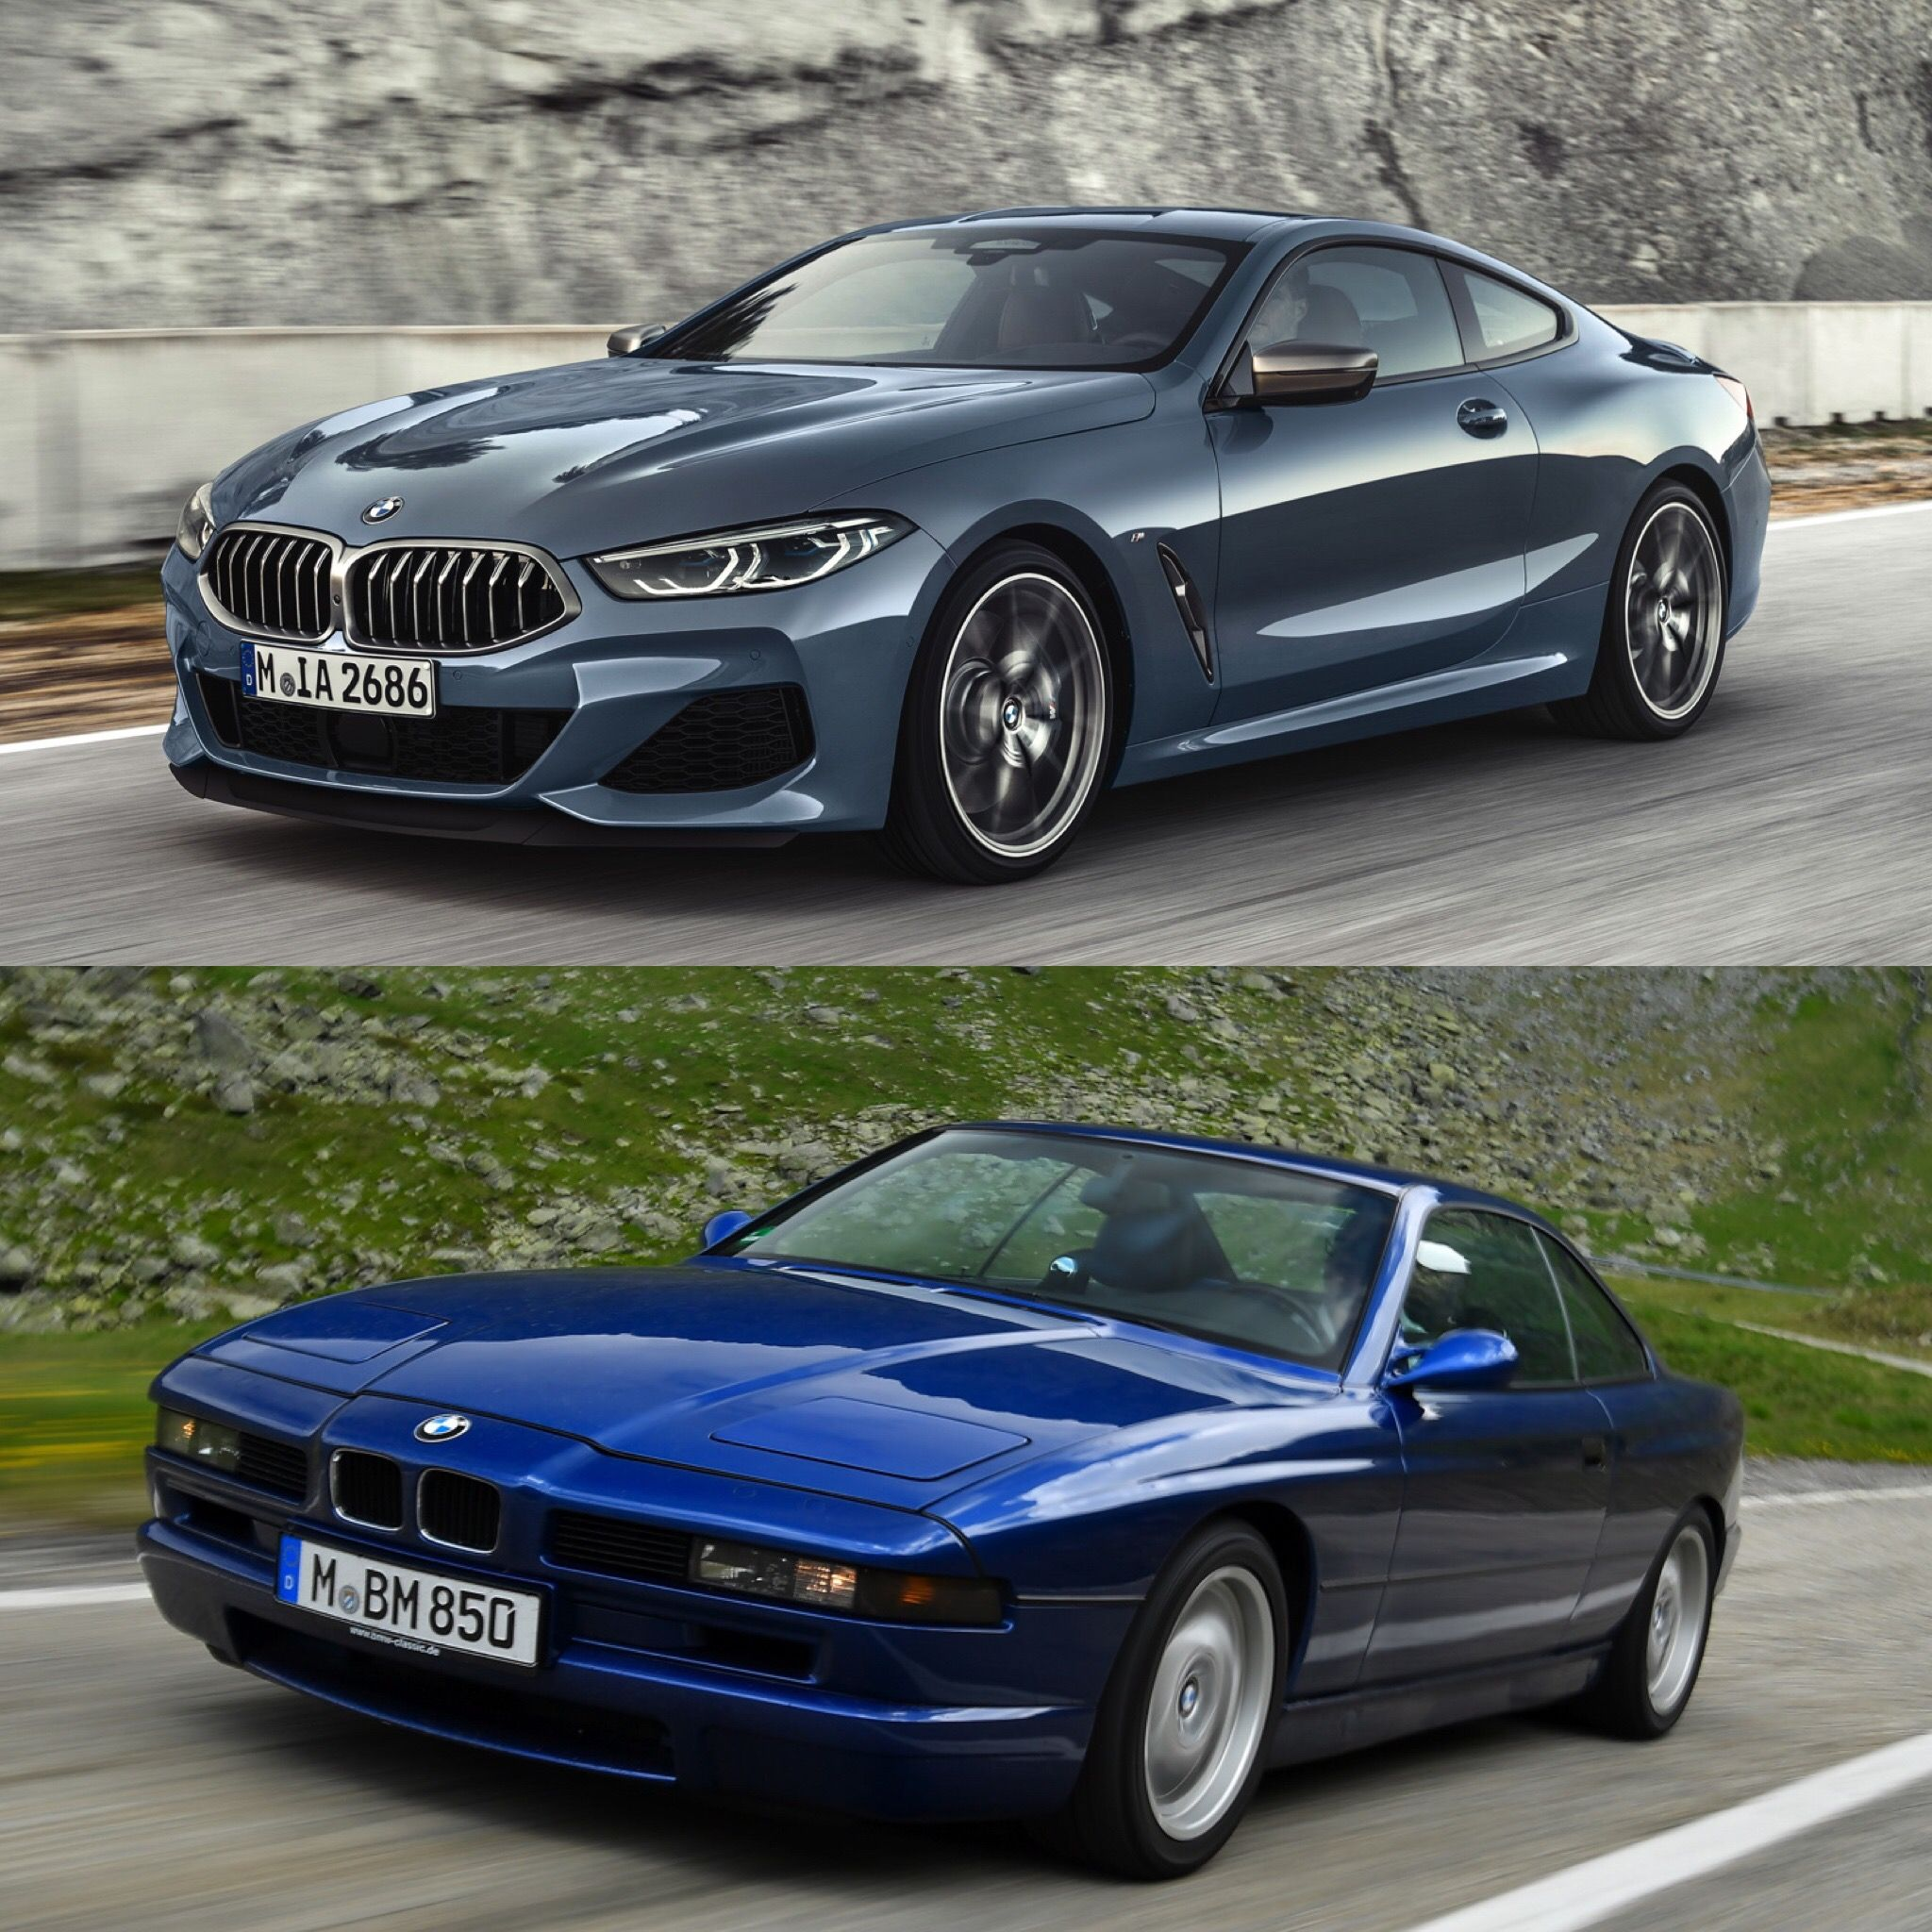 Photo Comparison Old Bmw 8 Series Vs New Bmw 8 Series New Bmw